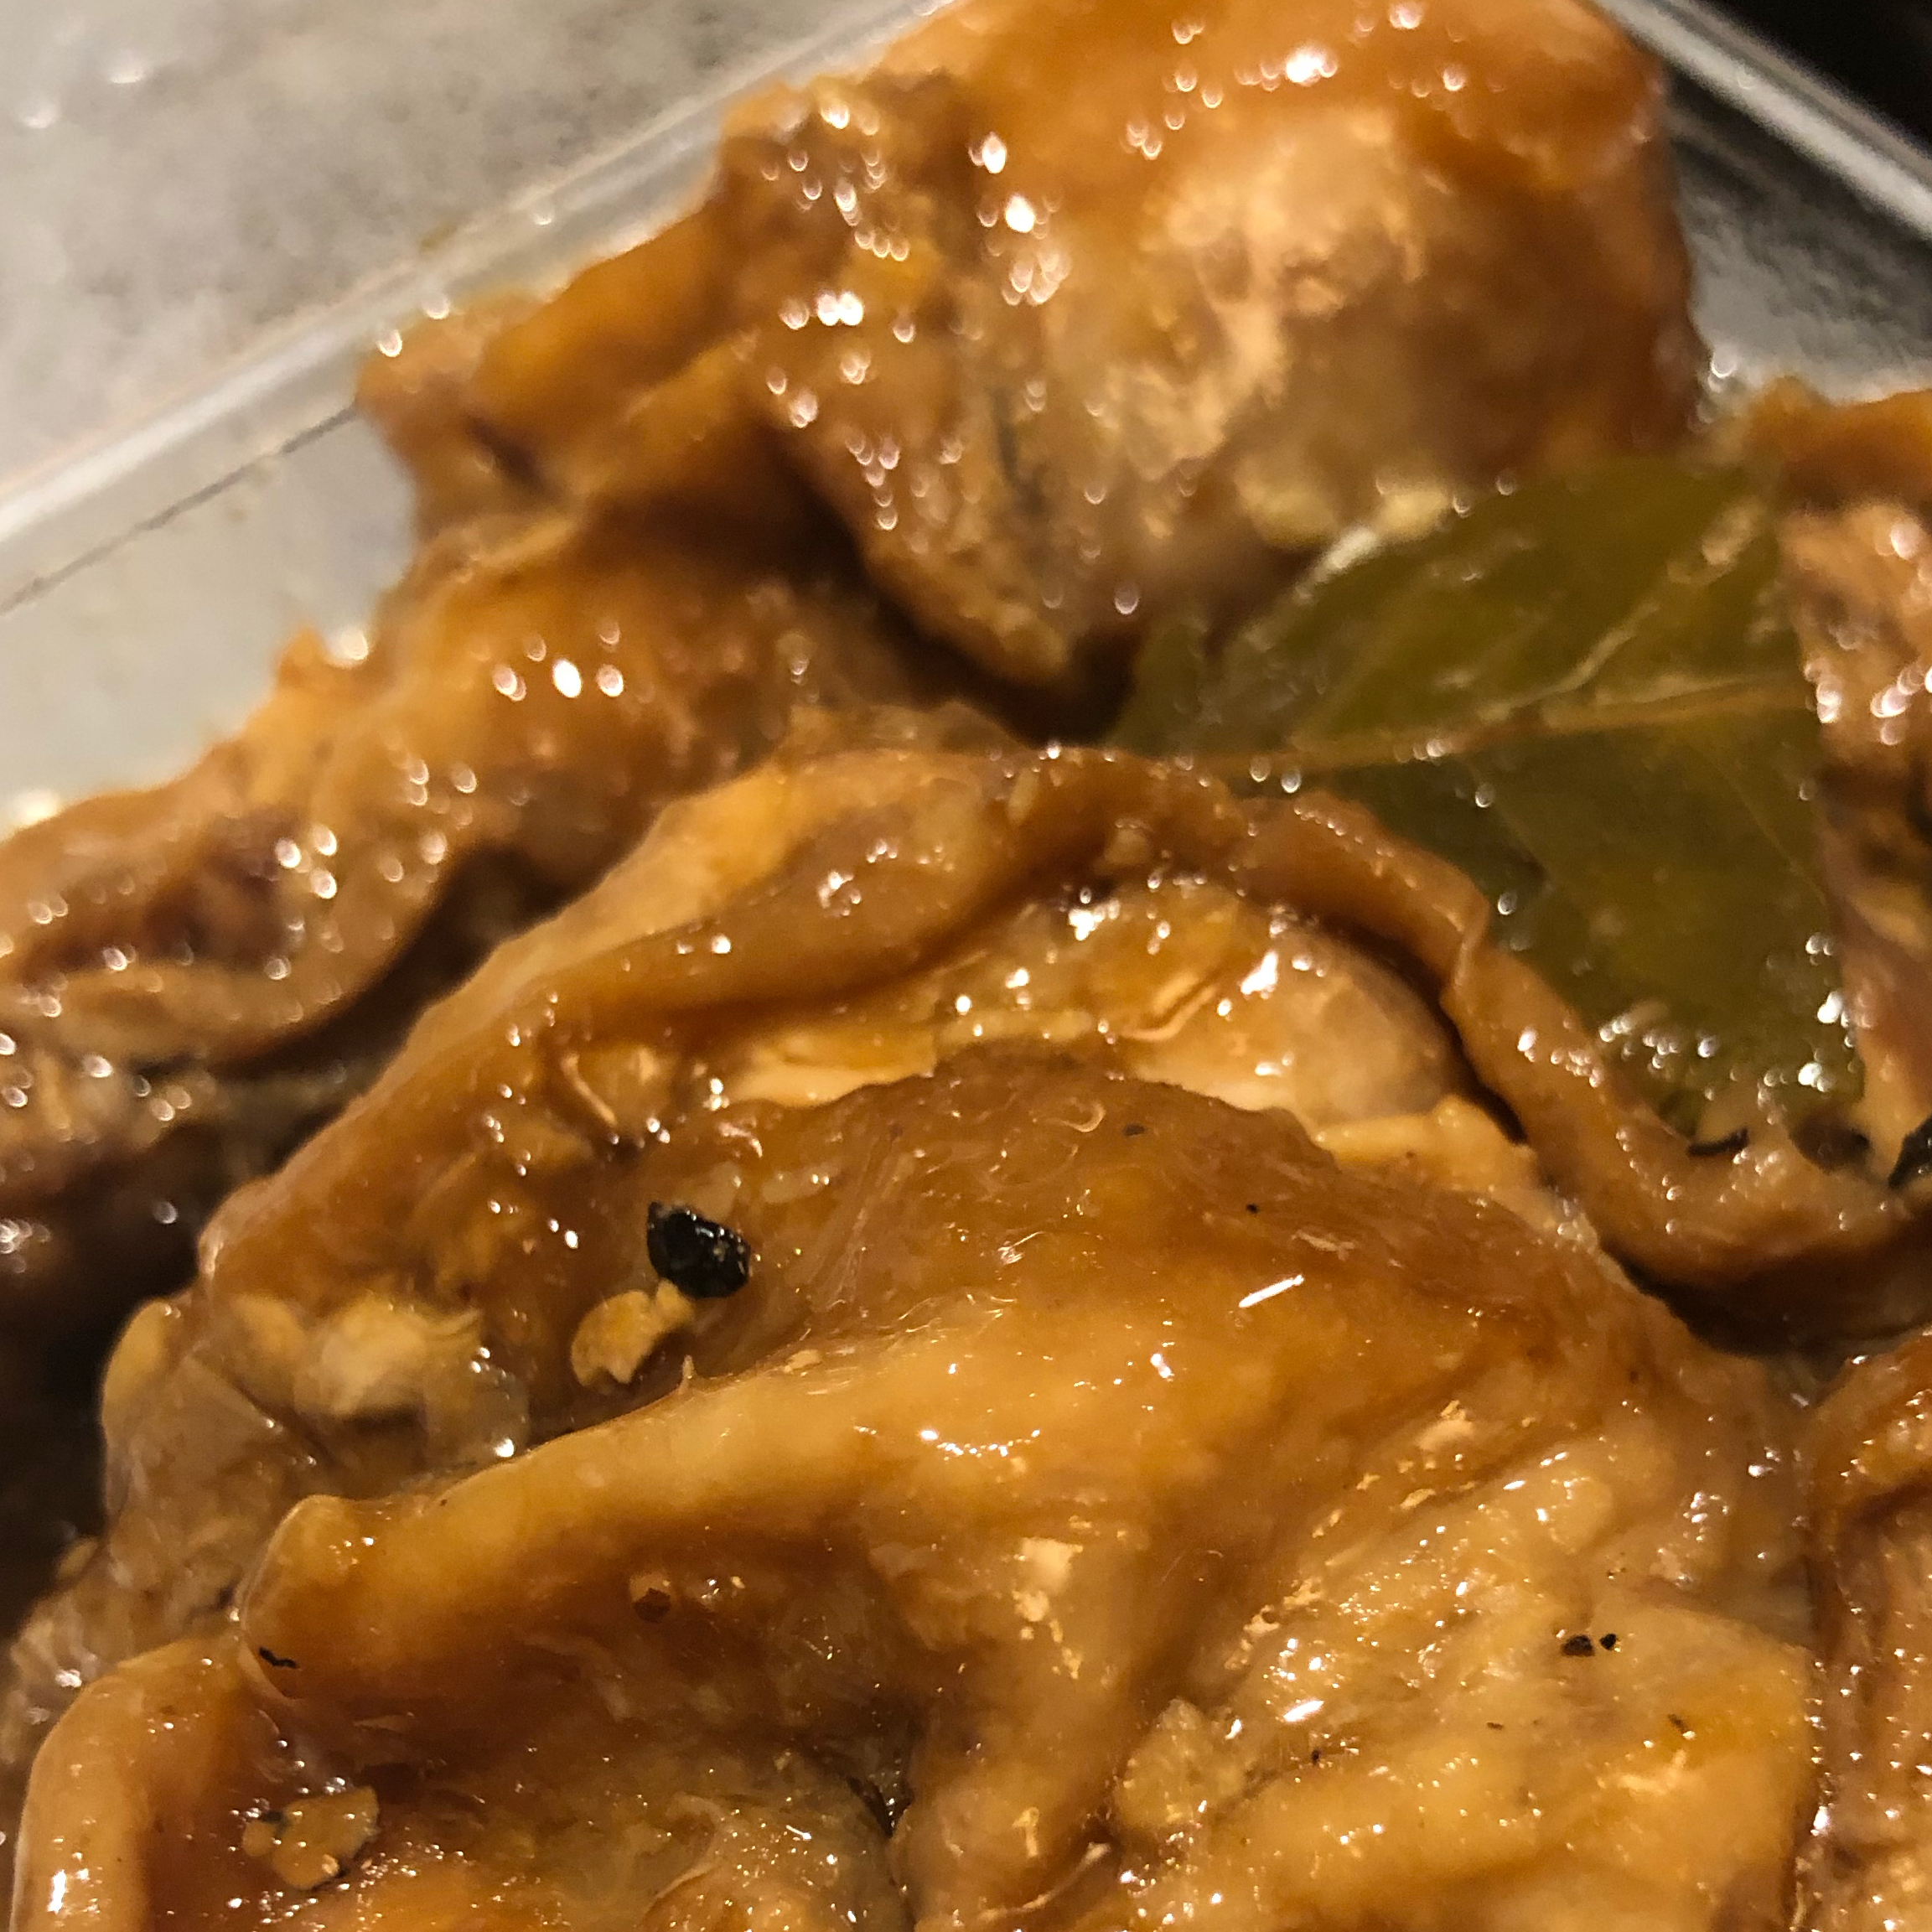 Lolah's Chicken Adobo Fabiola Sanabria Elias